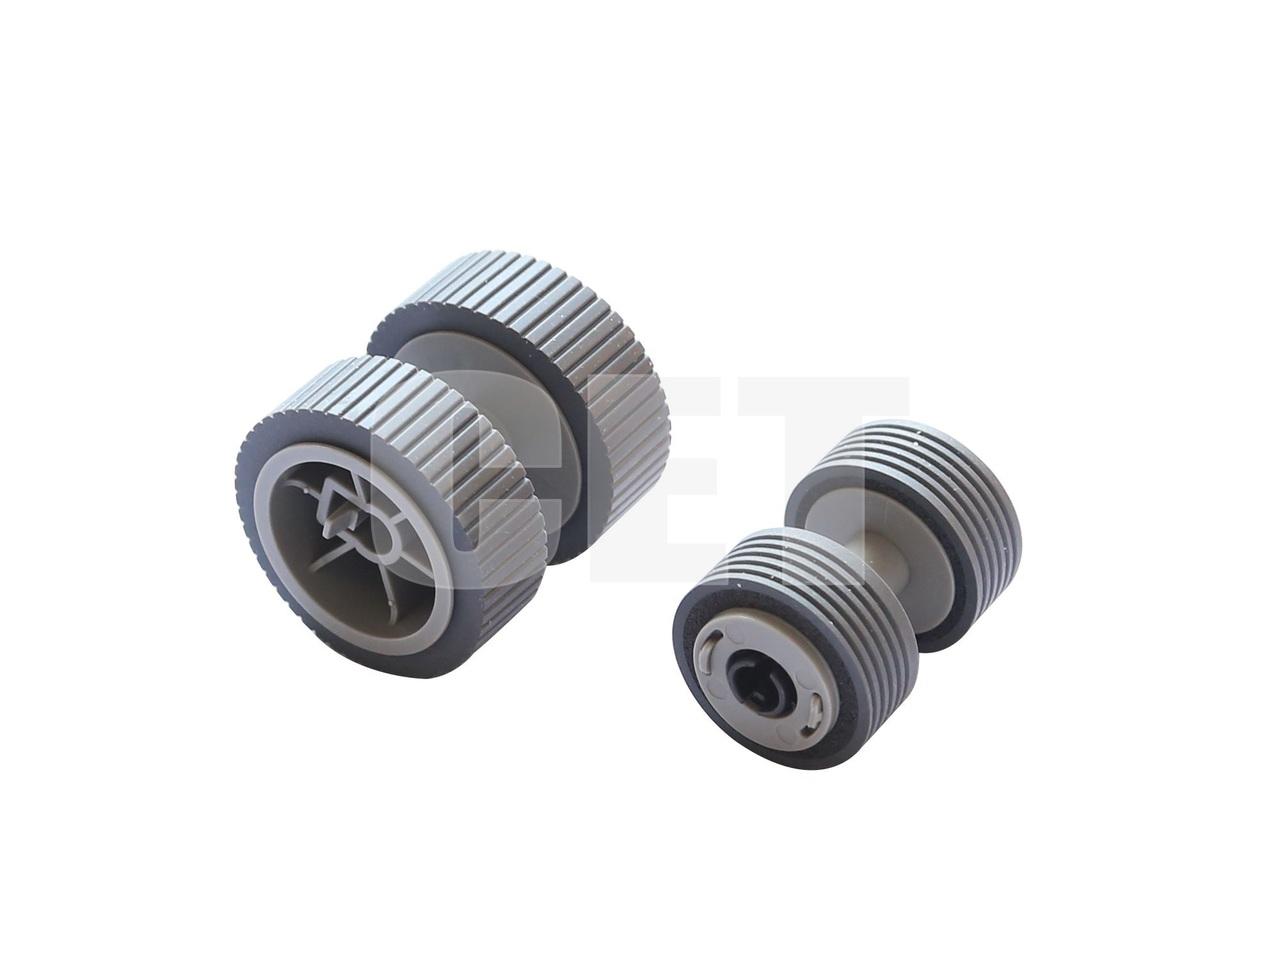 Комплект роликов PA03540-0002(1Pc), PA03540-0001(1Pc) дляFUJITSU fi-6130/6230/6140/6240 (CET), CET511006